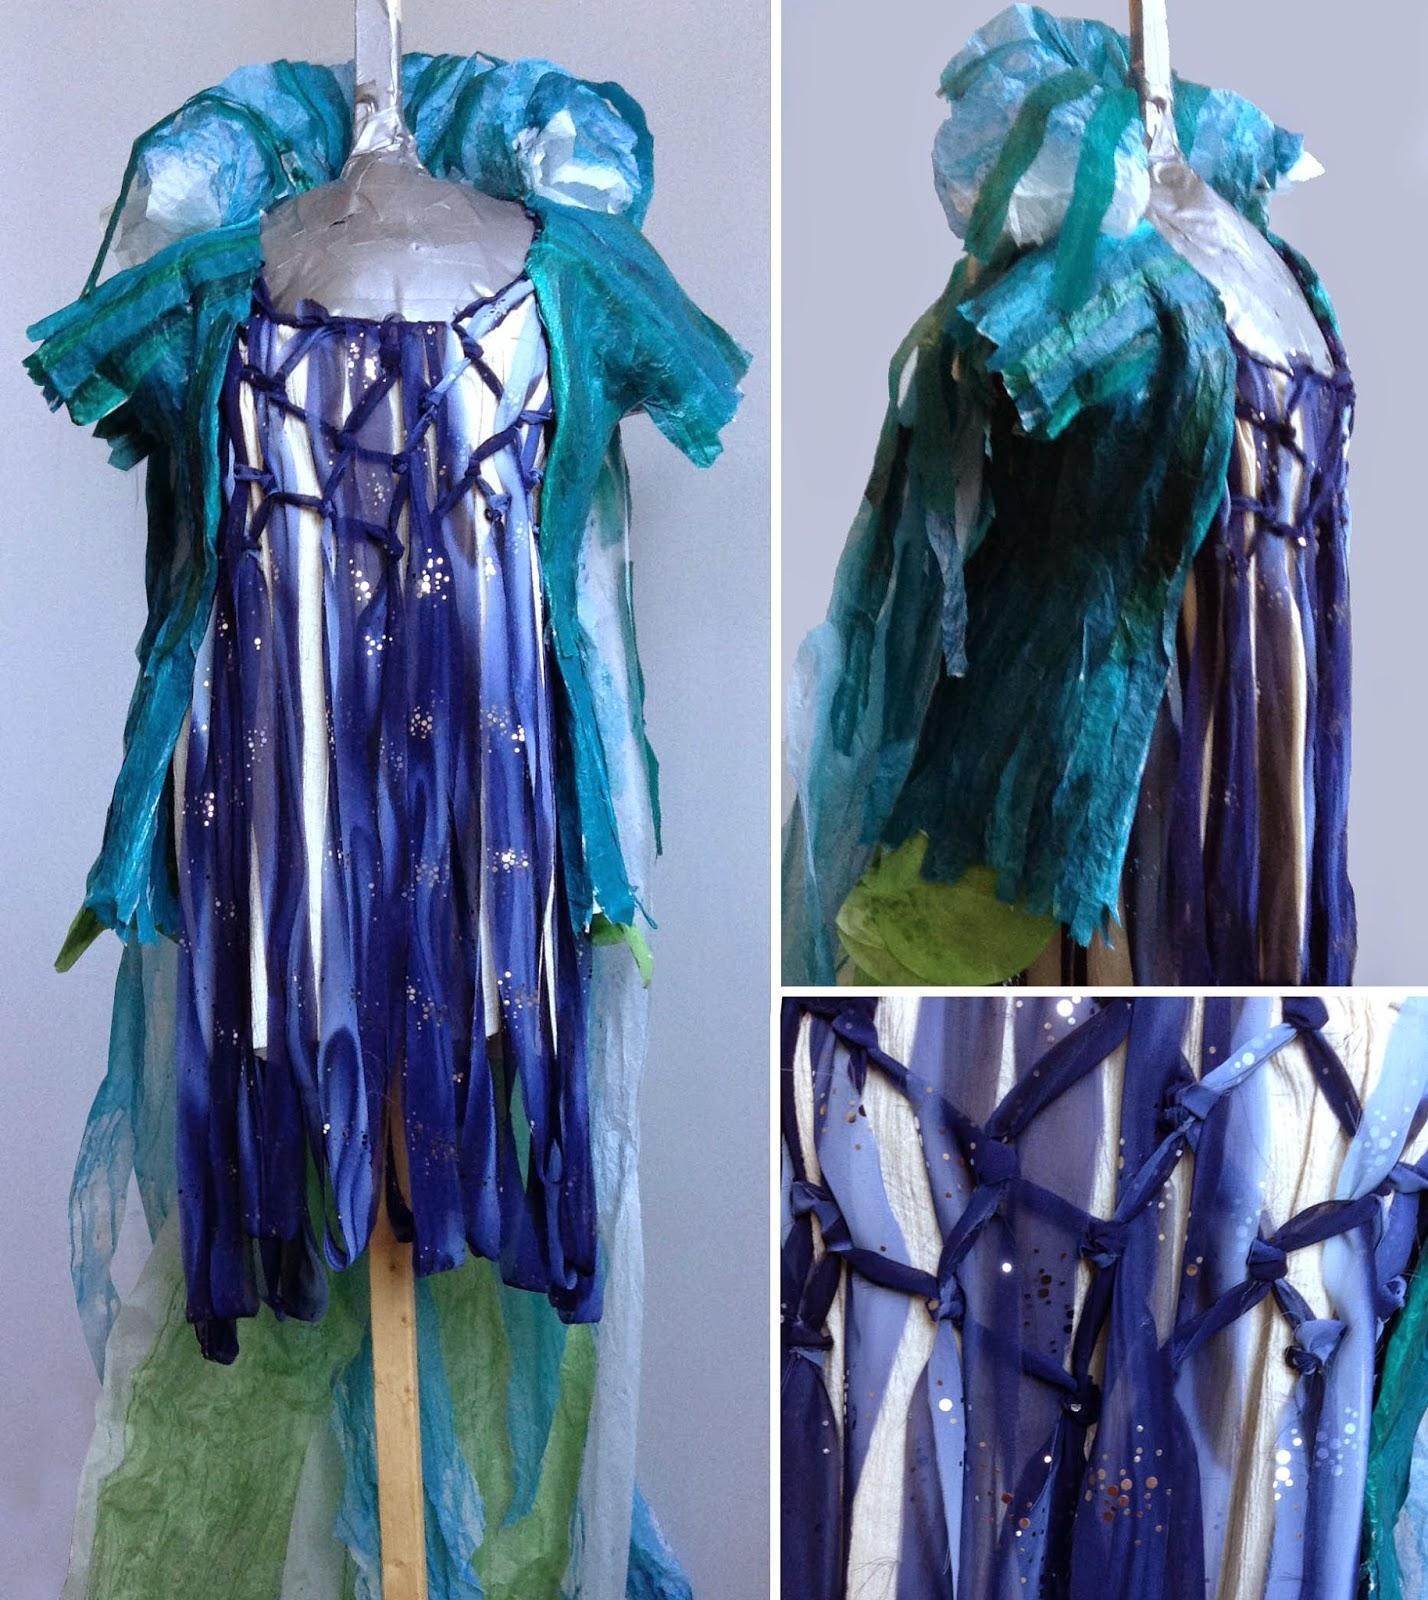 Peacock Dress and Jacket - © Samantha Grenier 2014